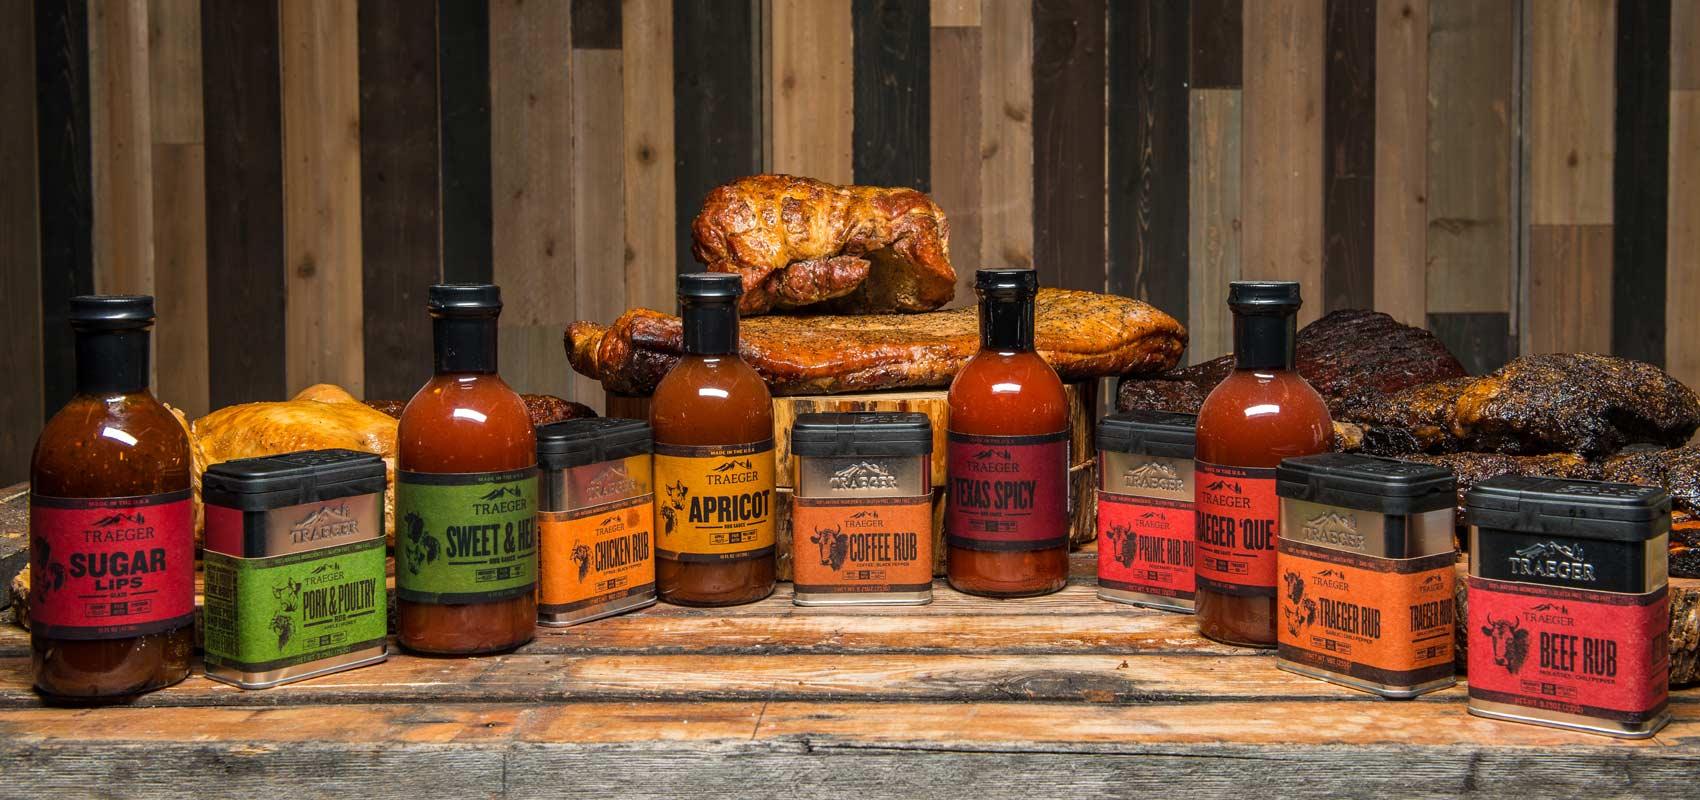 traeger-rubs-sauces.jpg